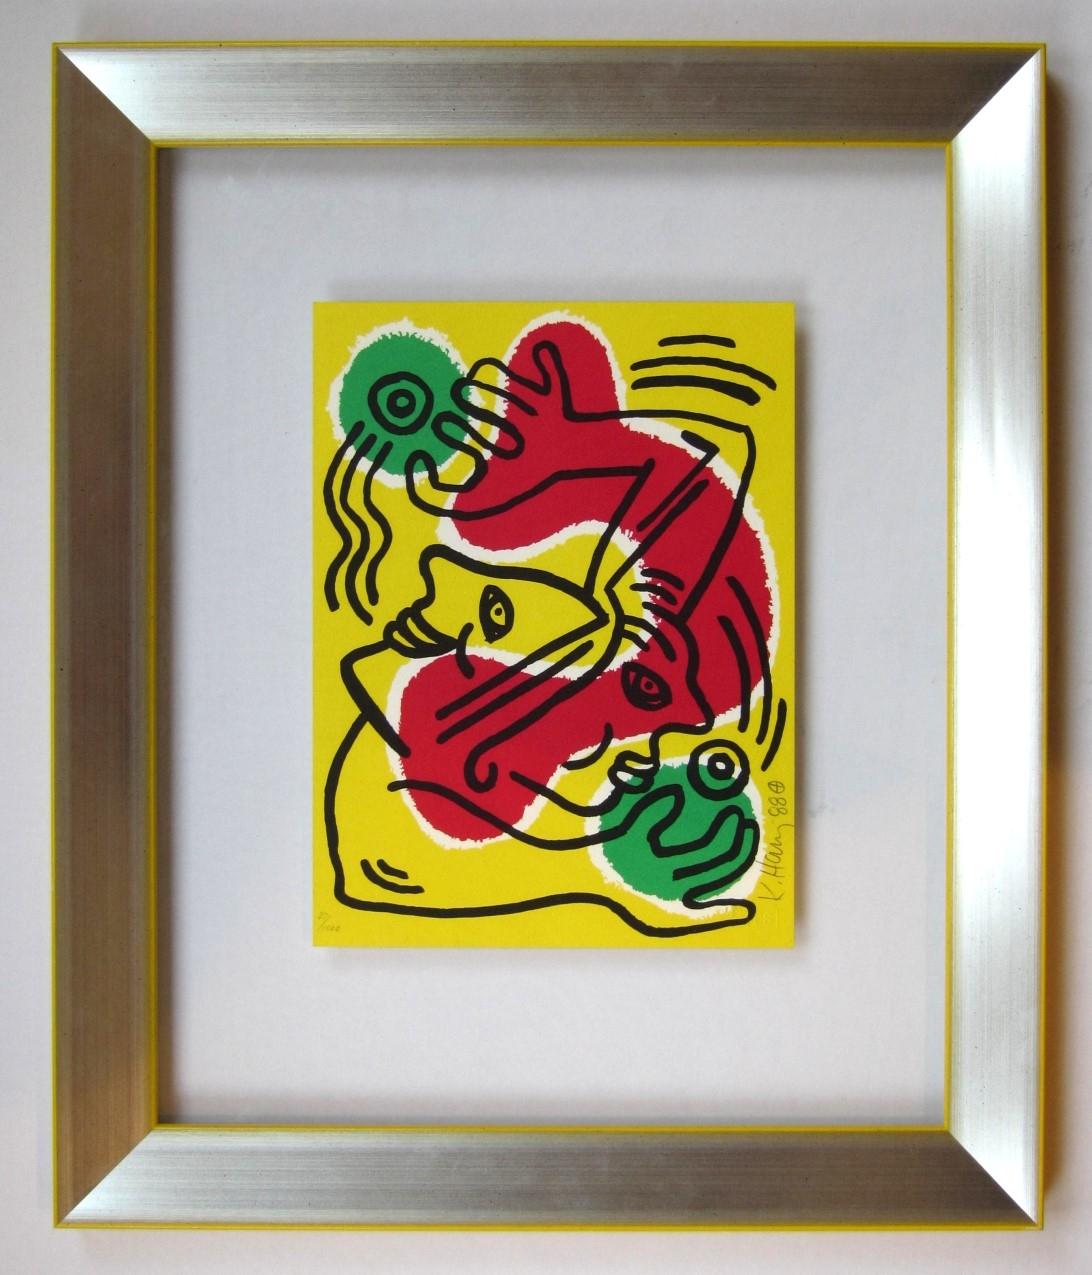 Keith Haring: International Volunteer Day